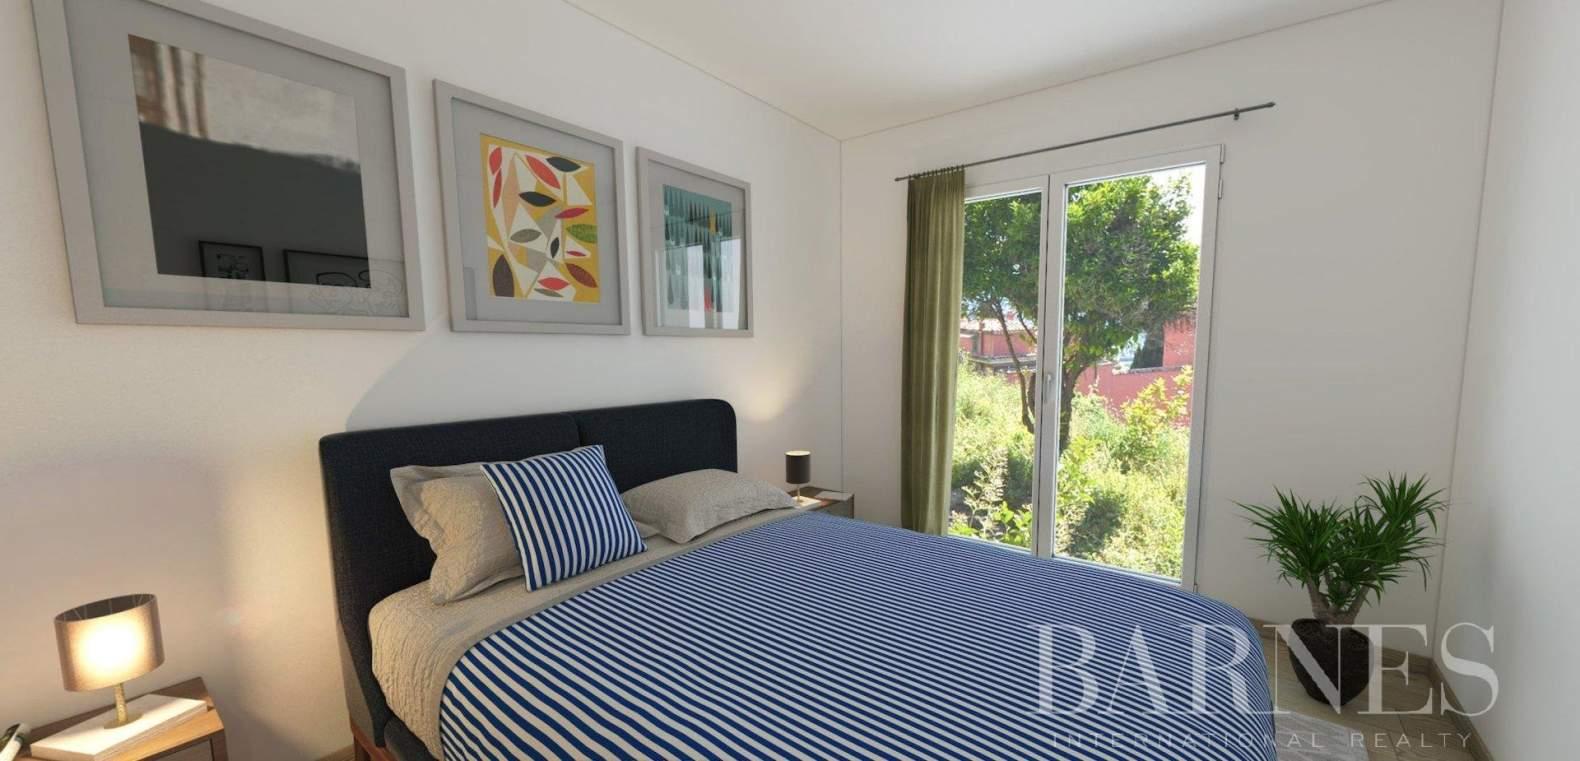 Grasse  - Appartement 3 Pièces 2 Chambres - picture 6